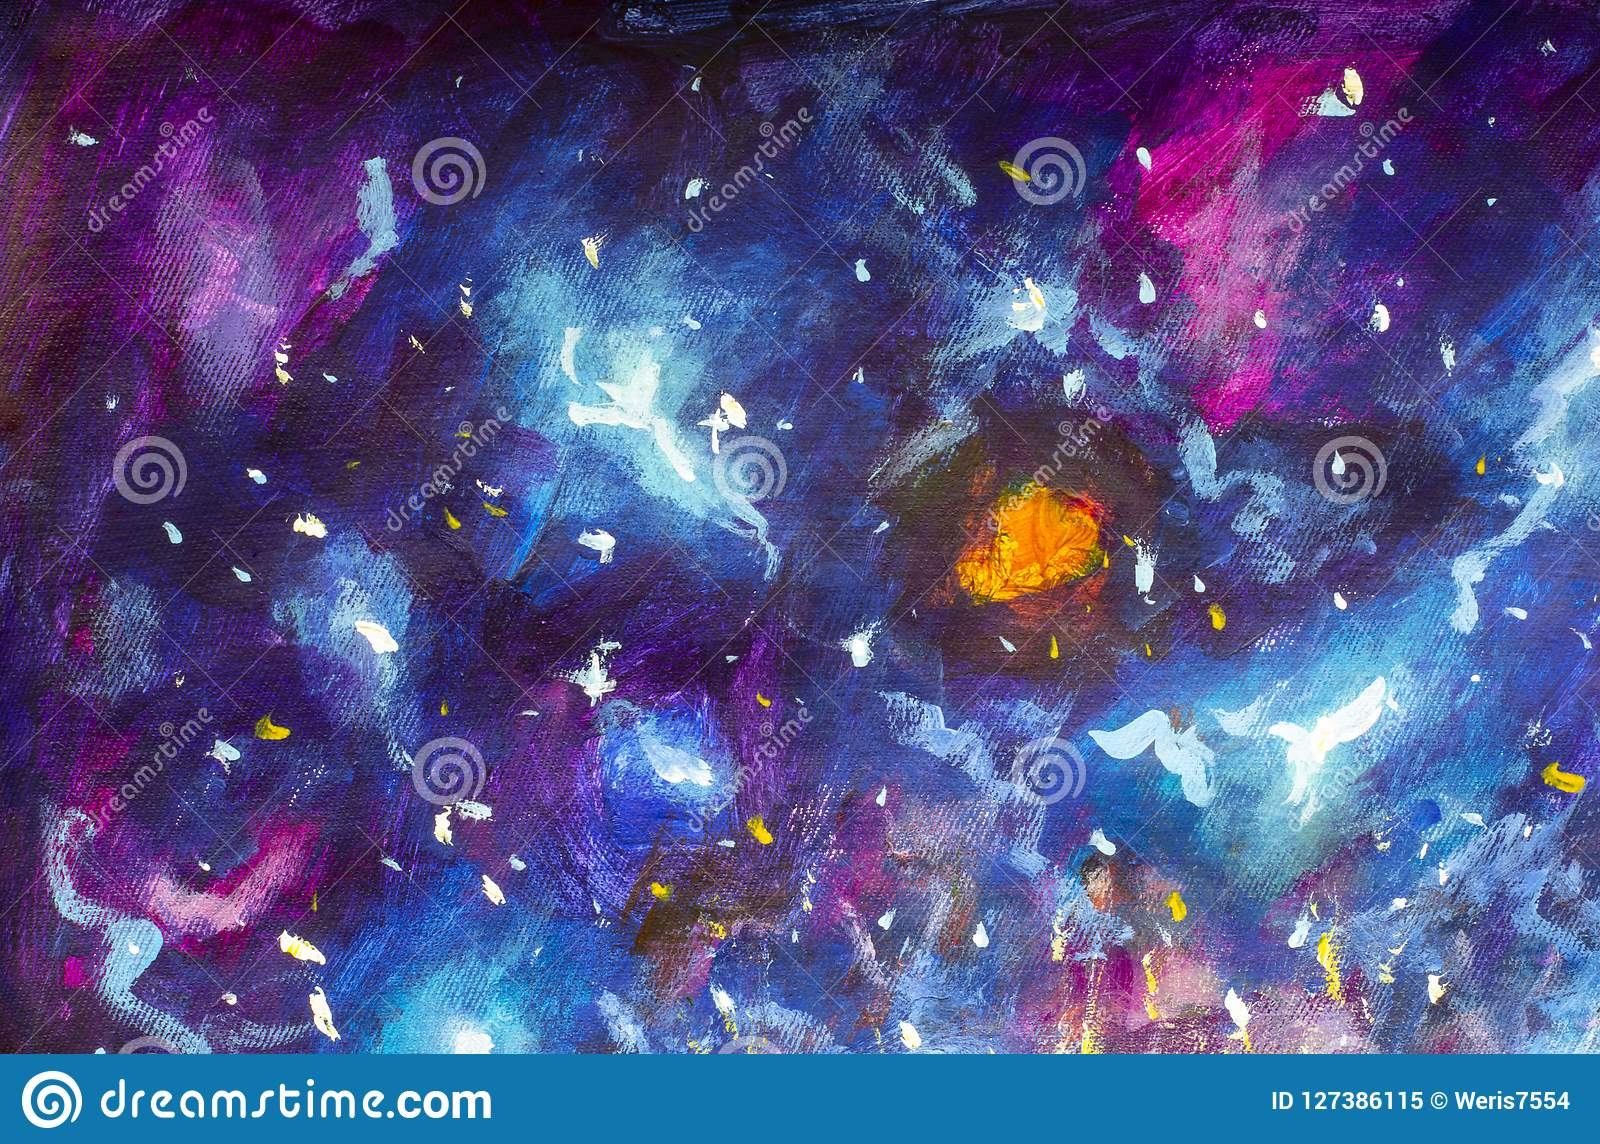 Pintura a óleo na lona cosmos Azul-violeta, o universo, galáxias da estrela Arte moderna